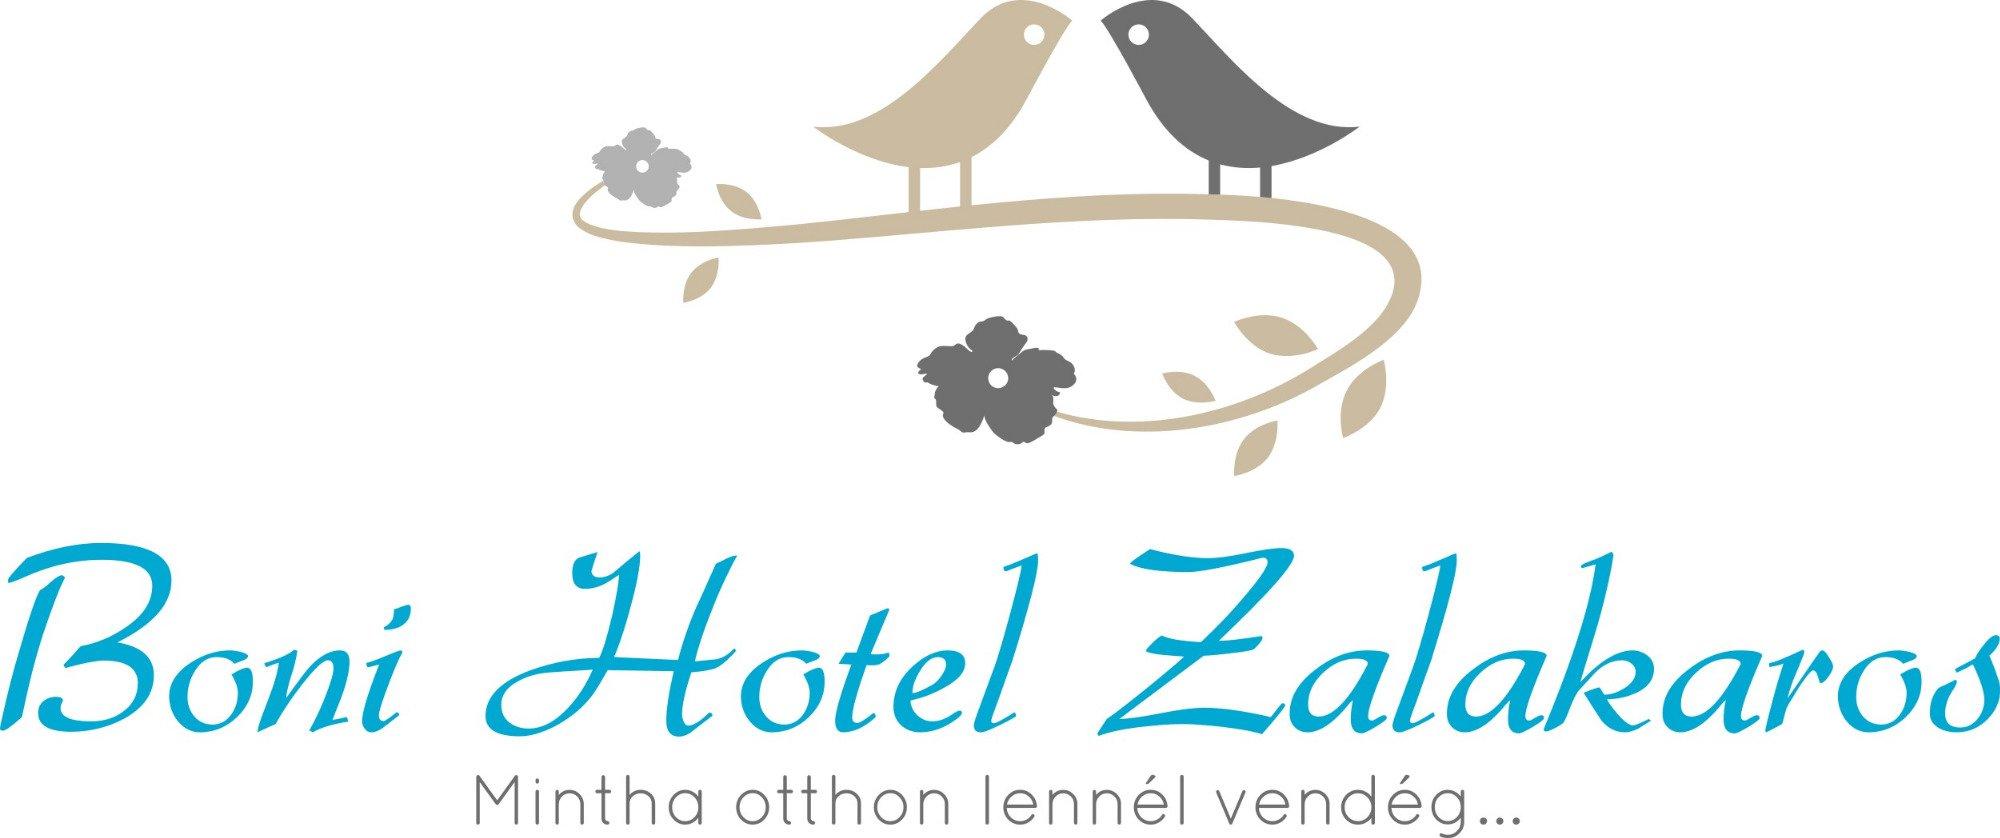 Boni Csaladi Wellness Hotel (Zalakaros, Hungary).